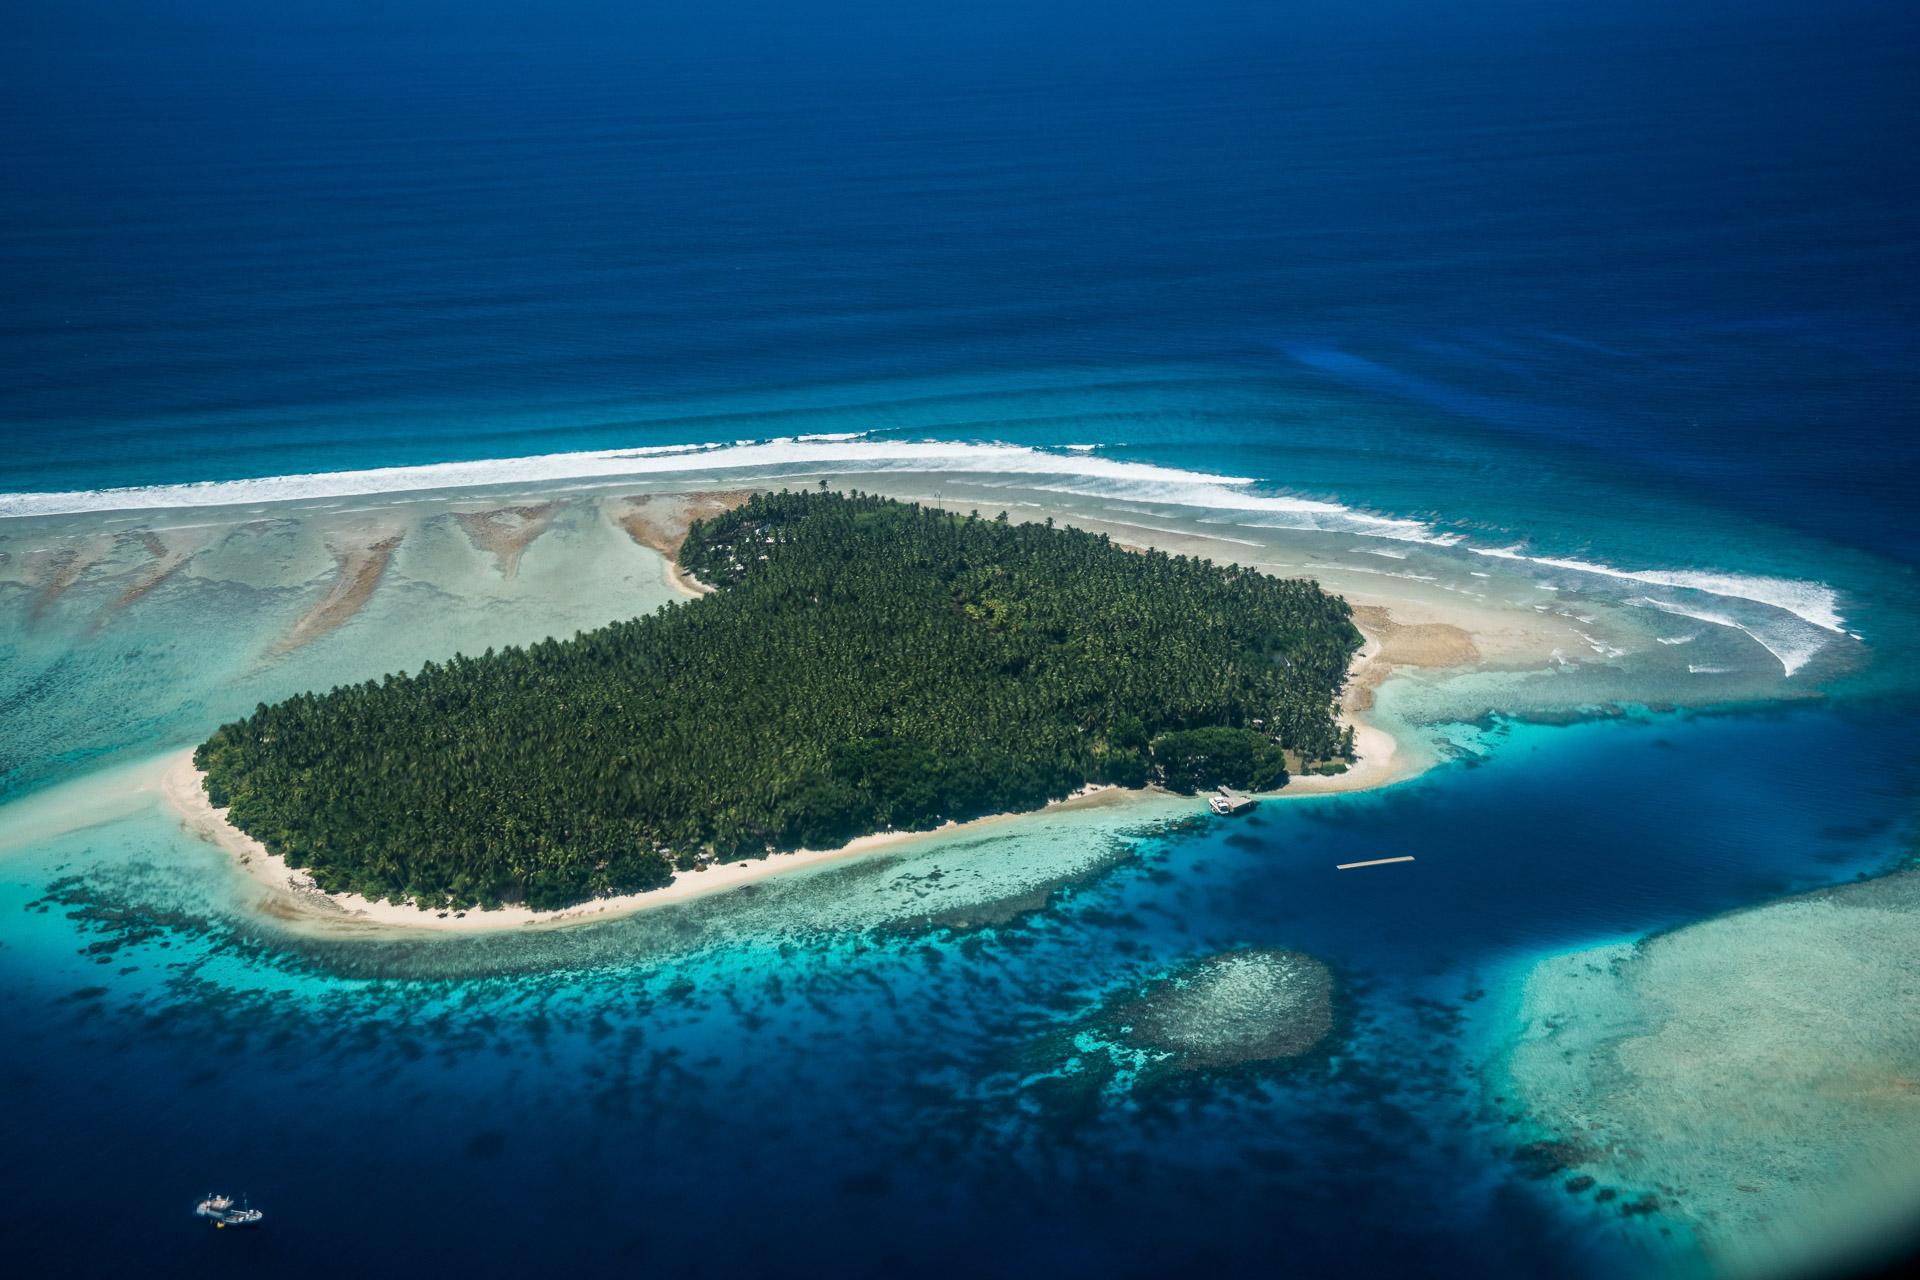 Marshall Islands Map, 1543238569473 Surfing Marshall Islands Beran Island Surf Lodge, Marshall Islands Map